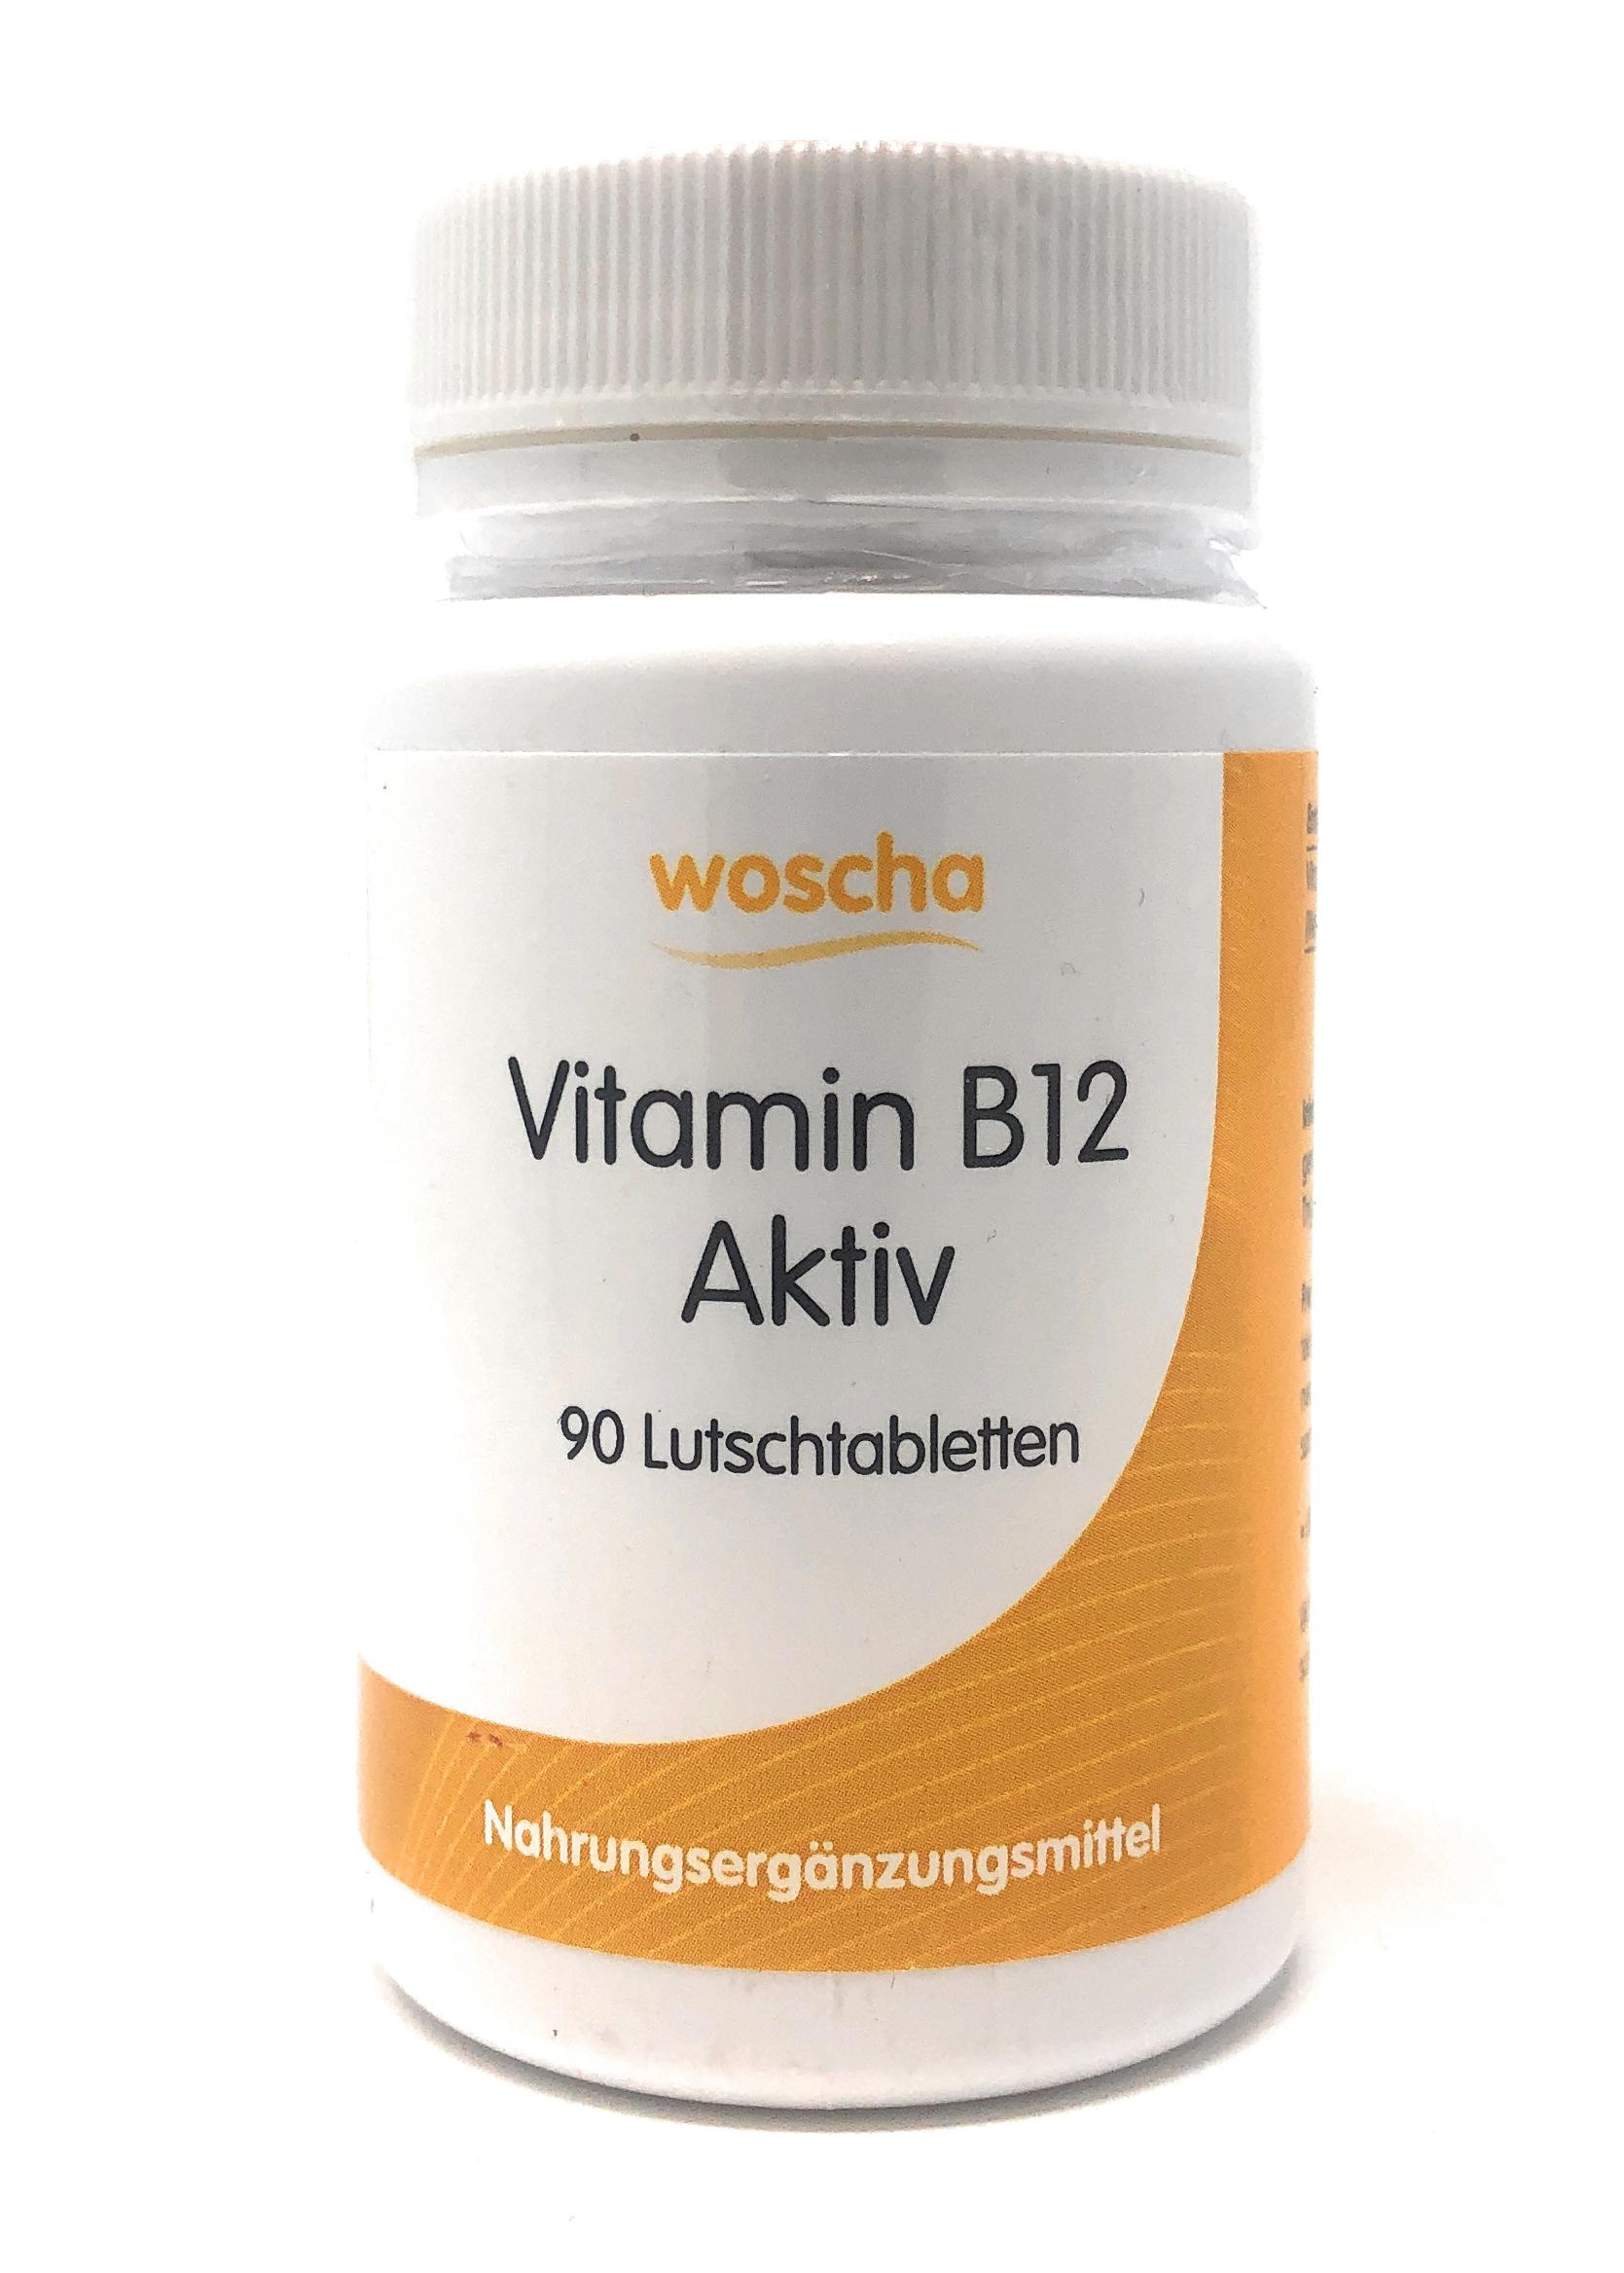 woscha B12 Aktiv (Methylcobalamin) 90 Lutschtabletten (53g) (vegan)